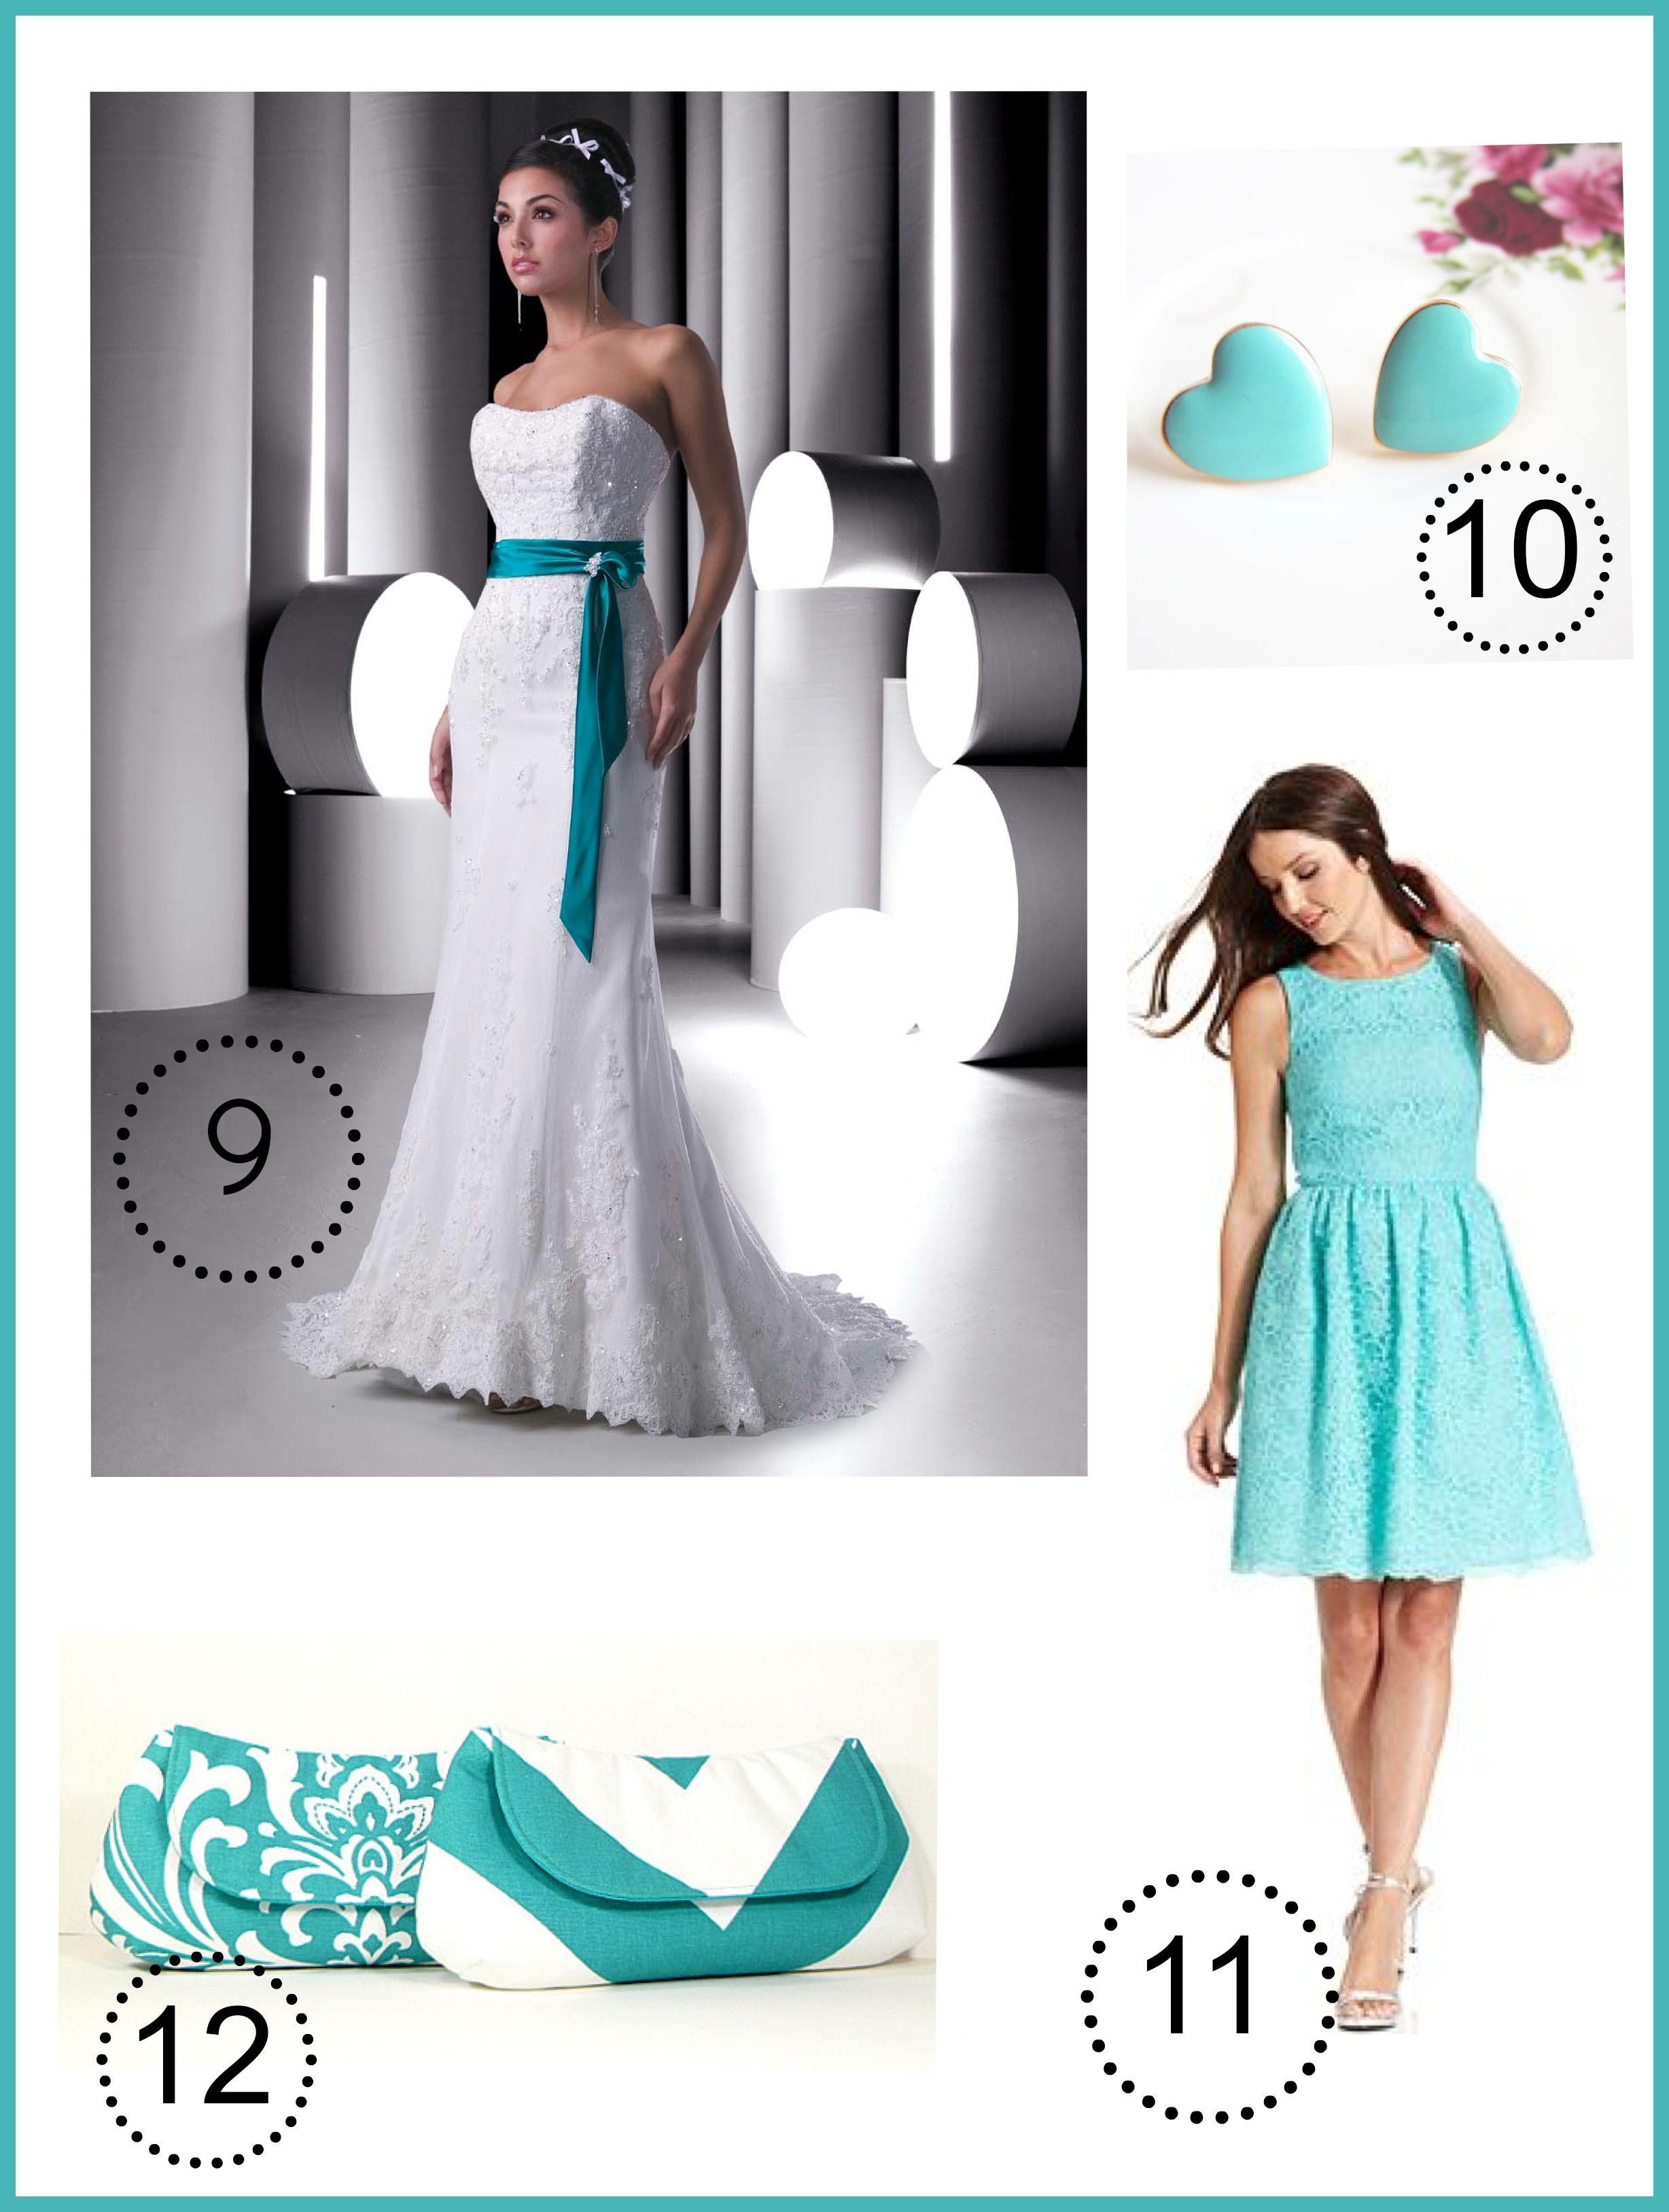 Turquoise Wedding Color Theme - Rustic Wedding Chic